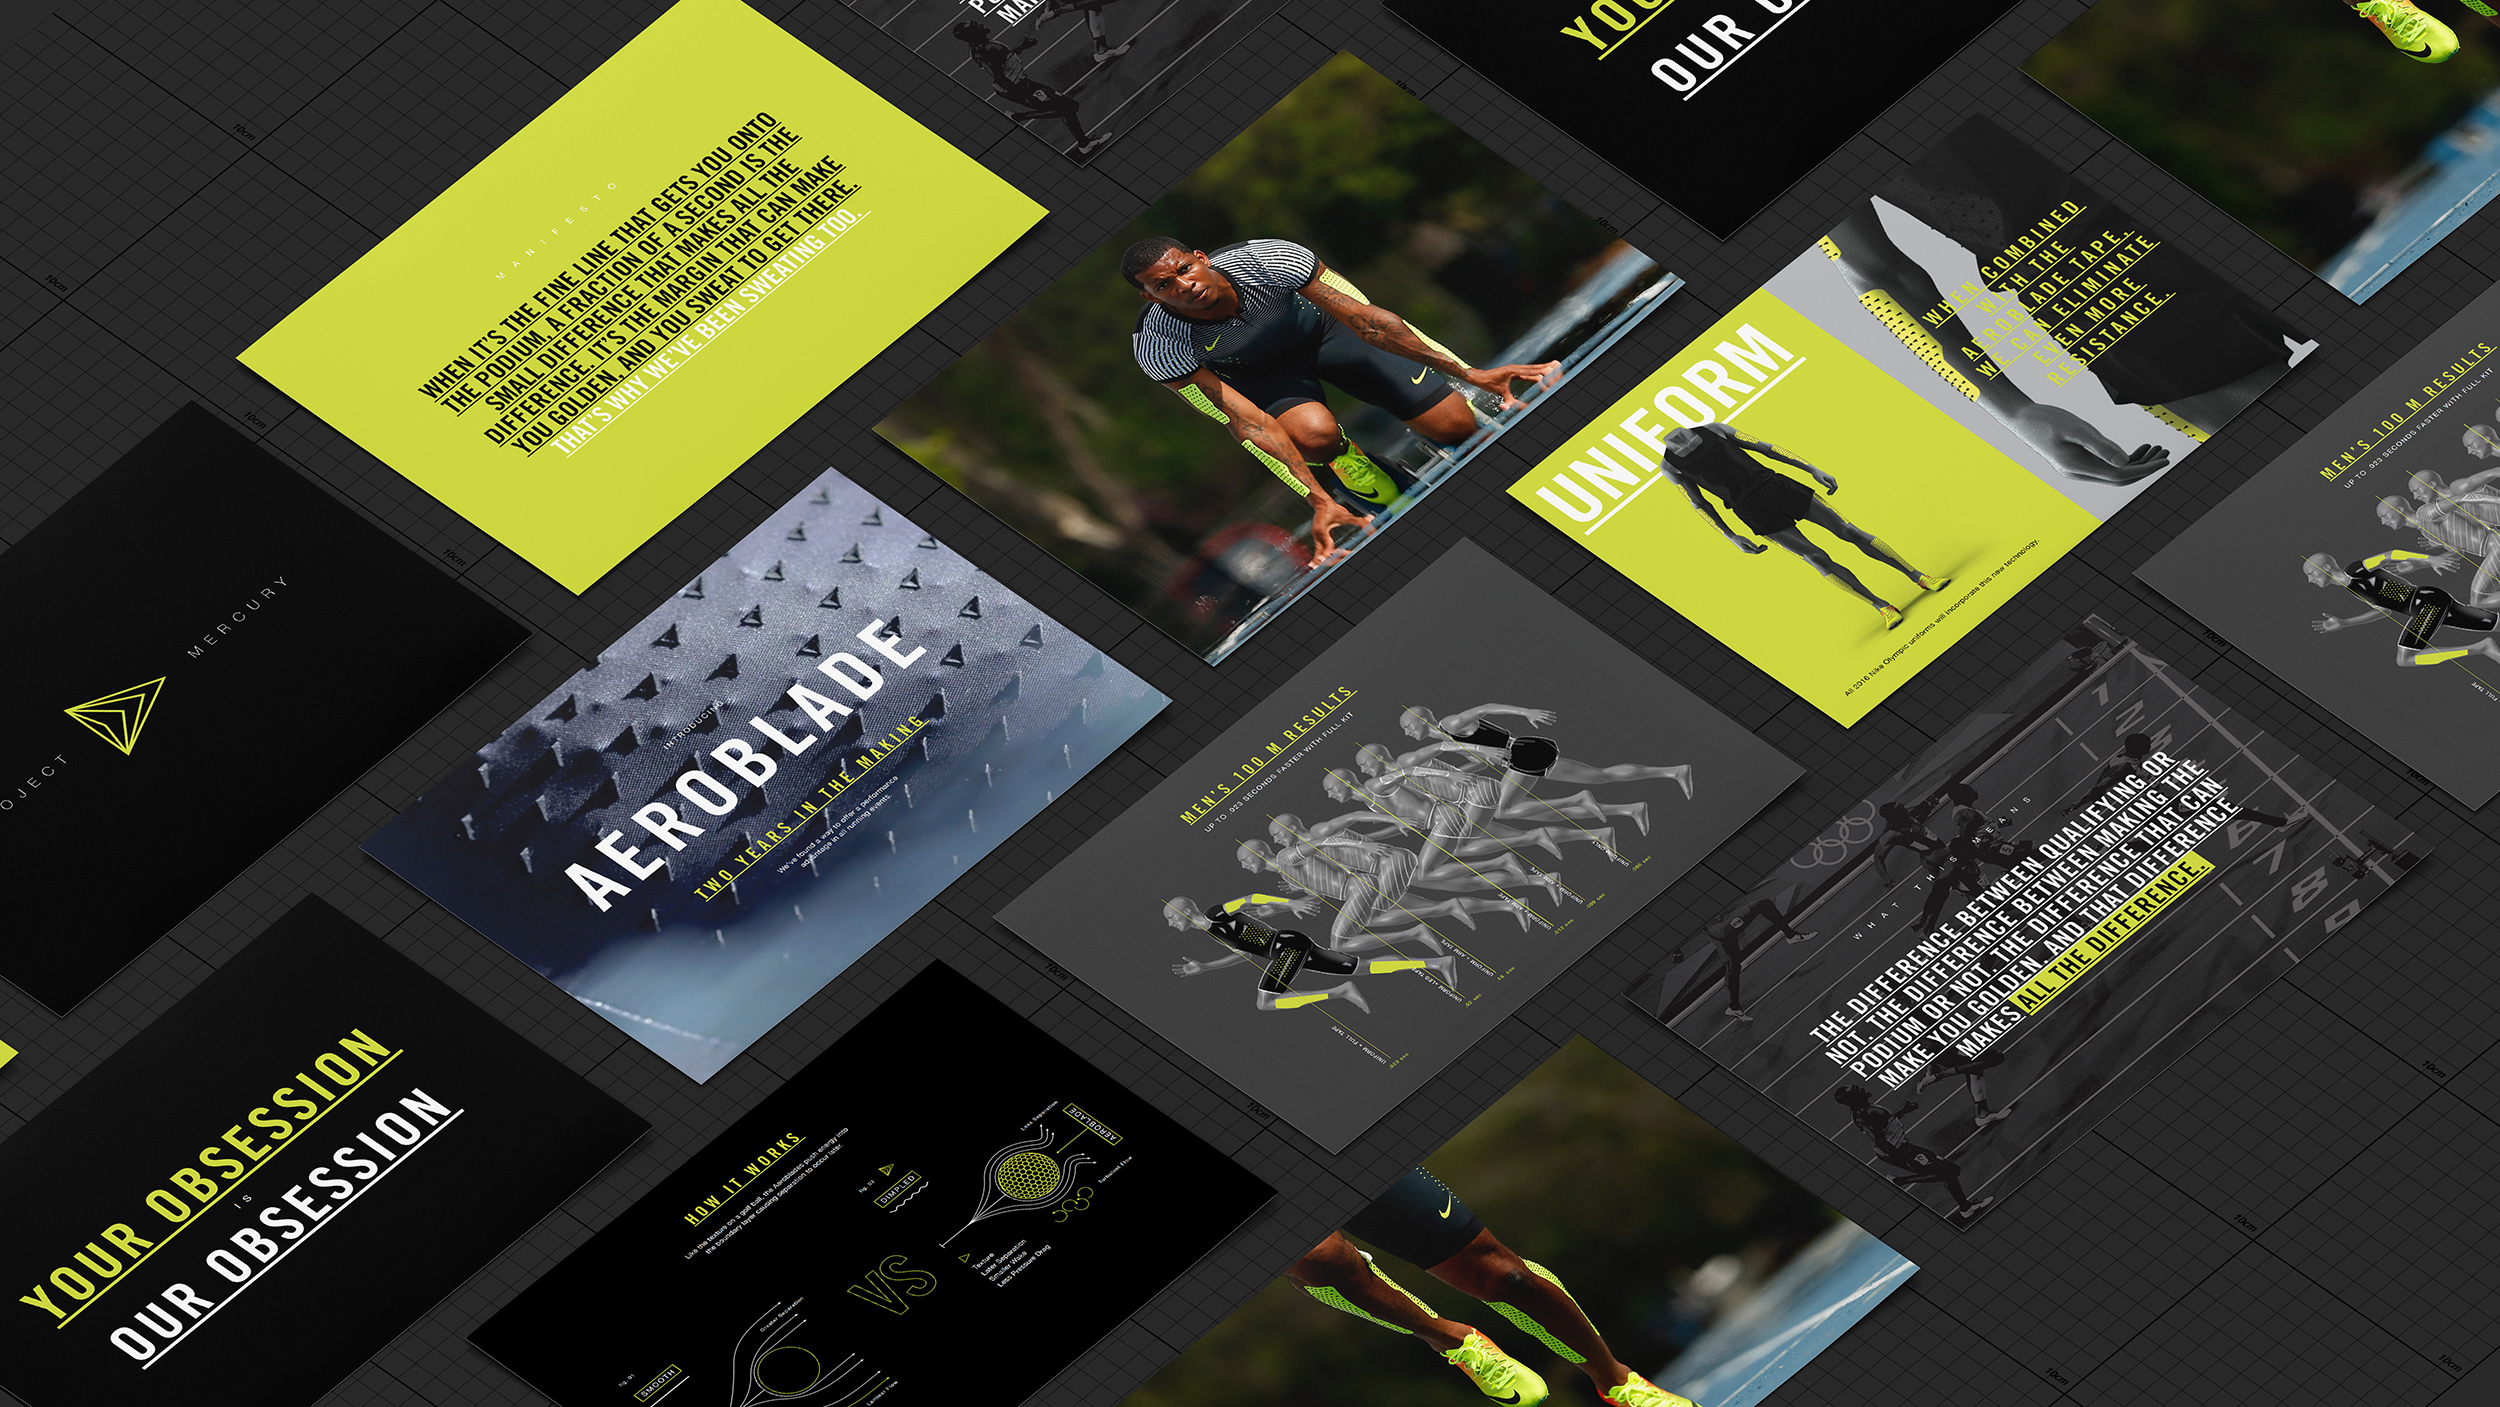 Ryan_Bubion_Nike_Innovation_03